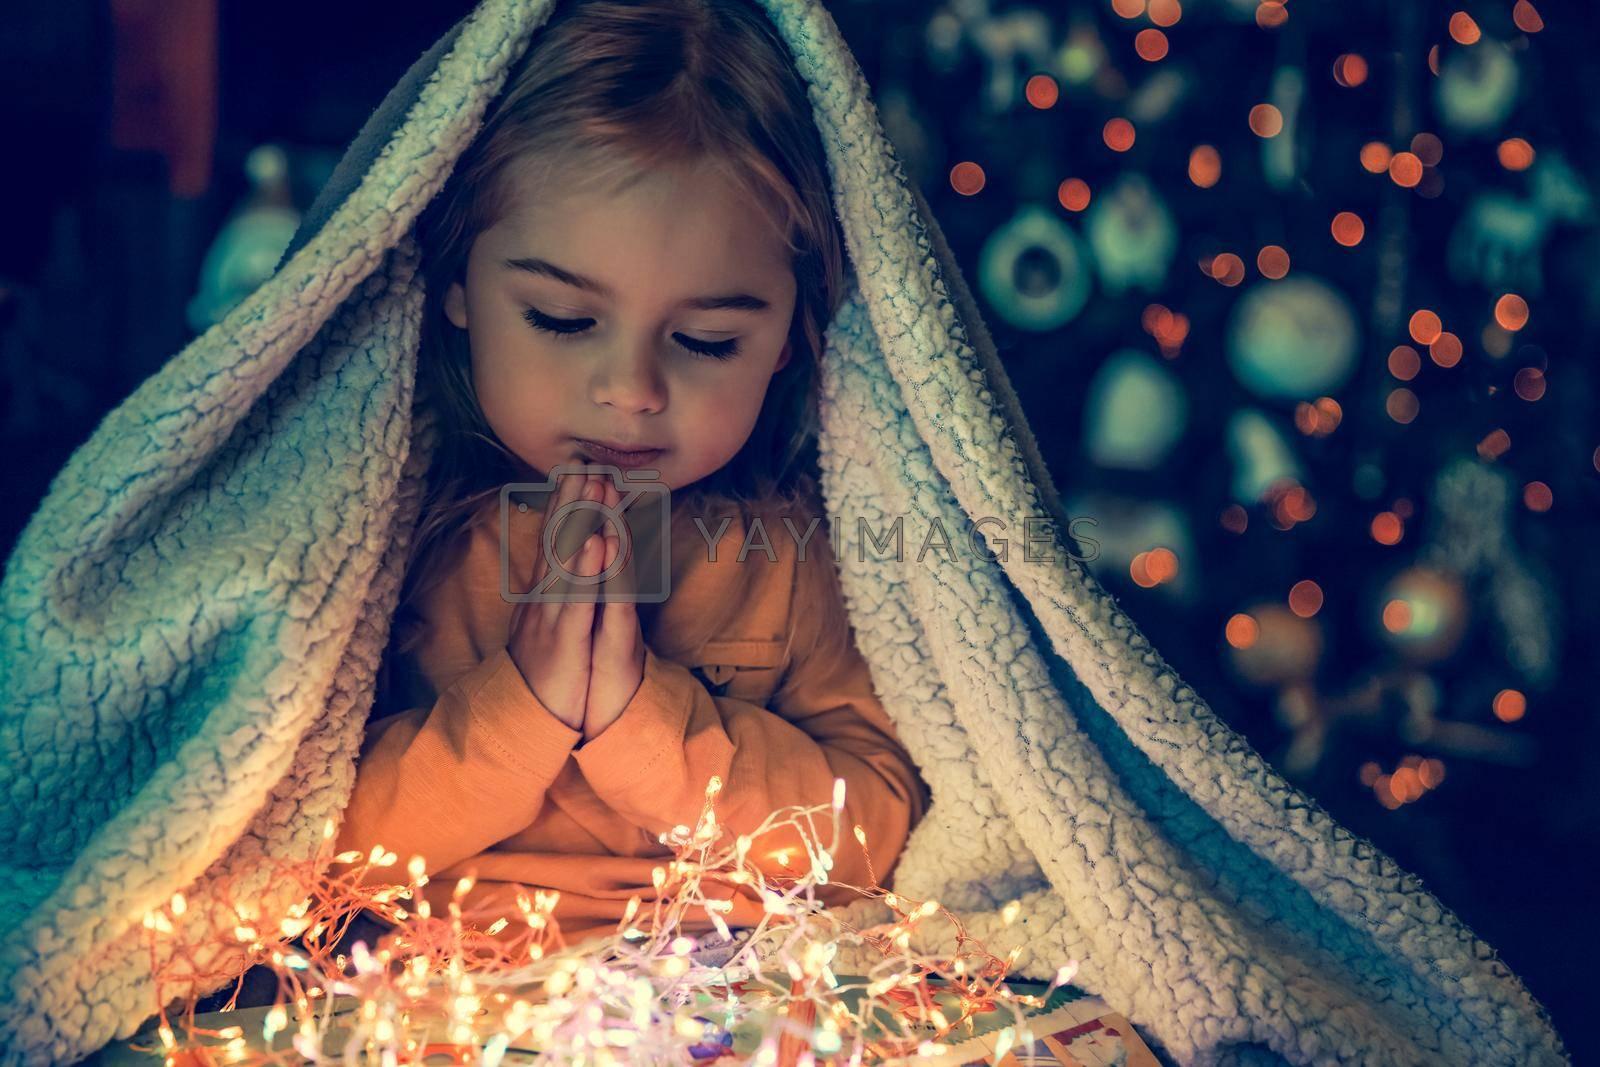 Kid Making Magic Wish for Winter Holidays. Baby Near the Christmas Tree at Home. Under the Plaid Praying. Waiting for Santa at Night.